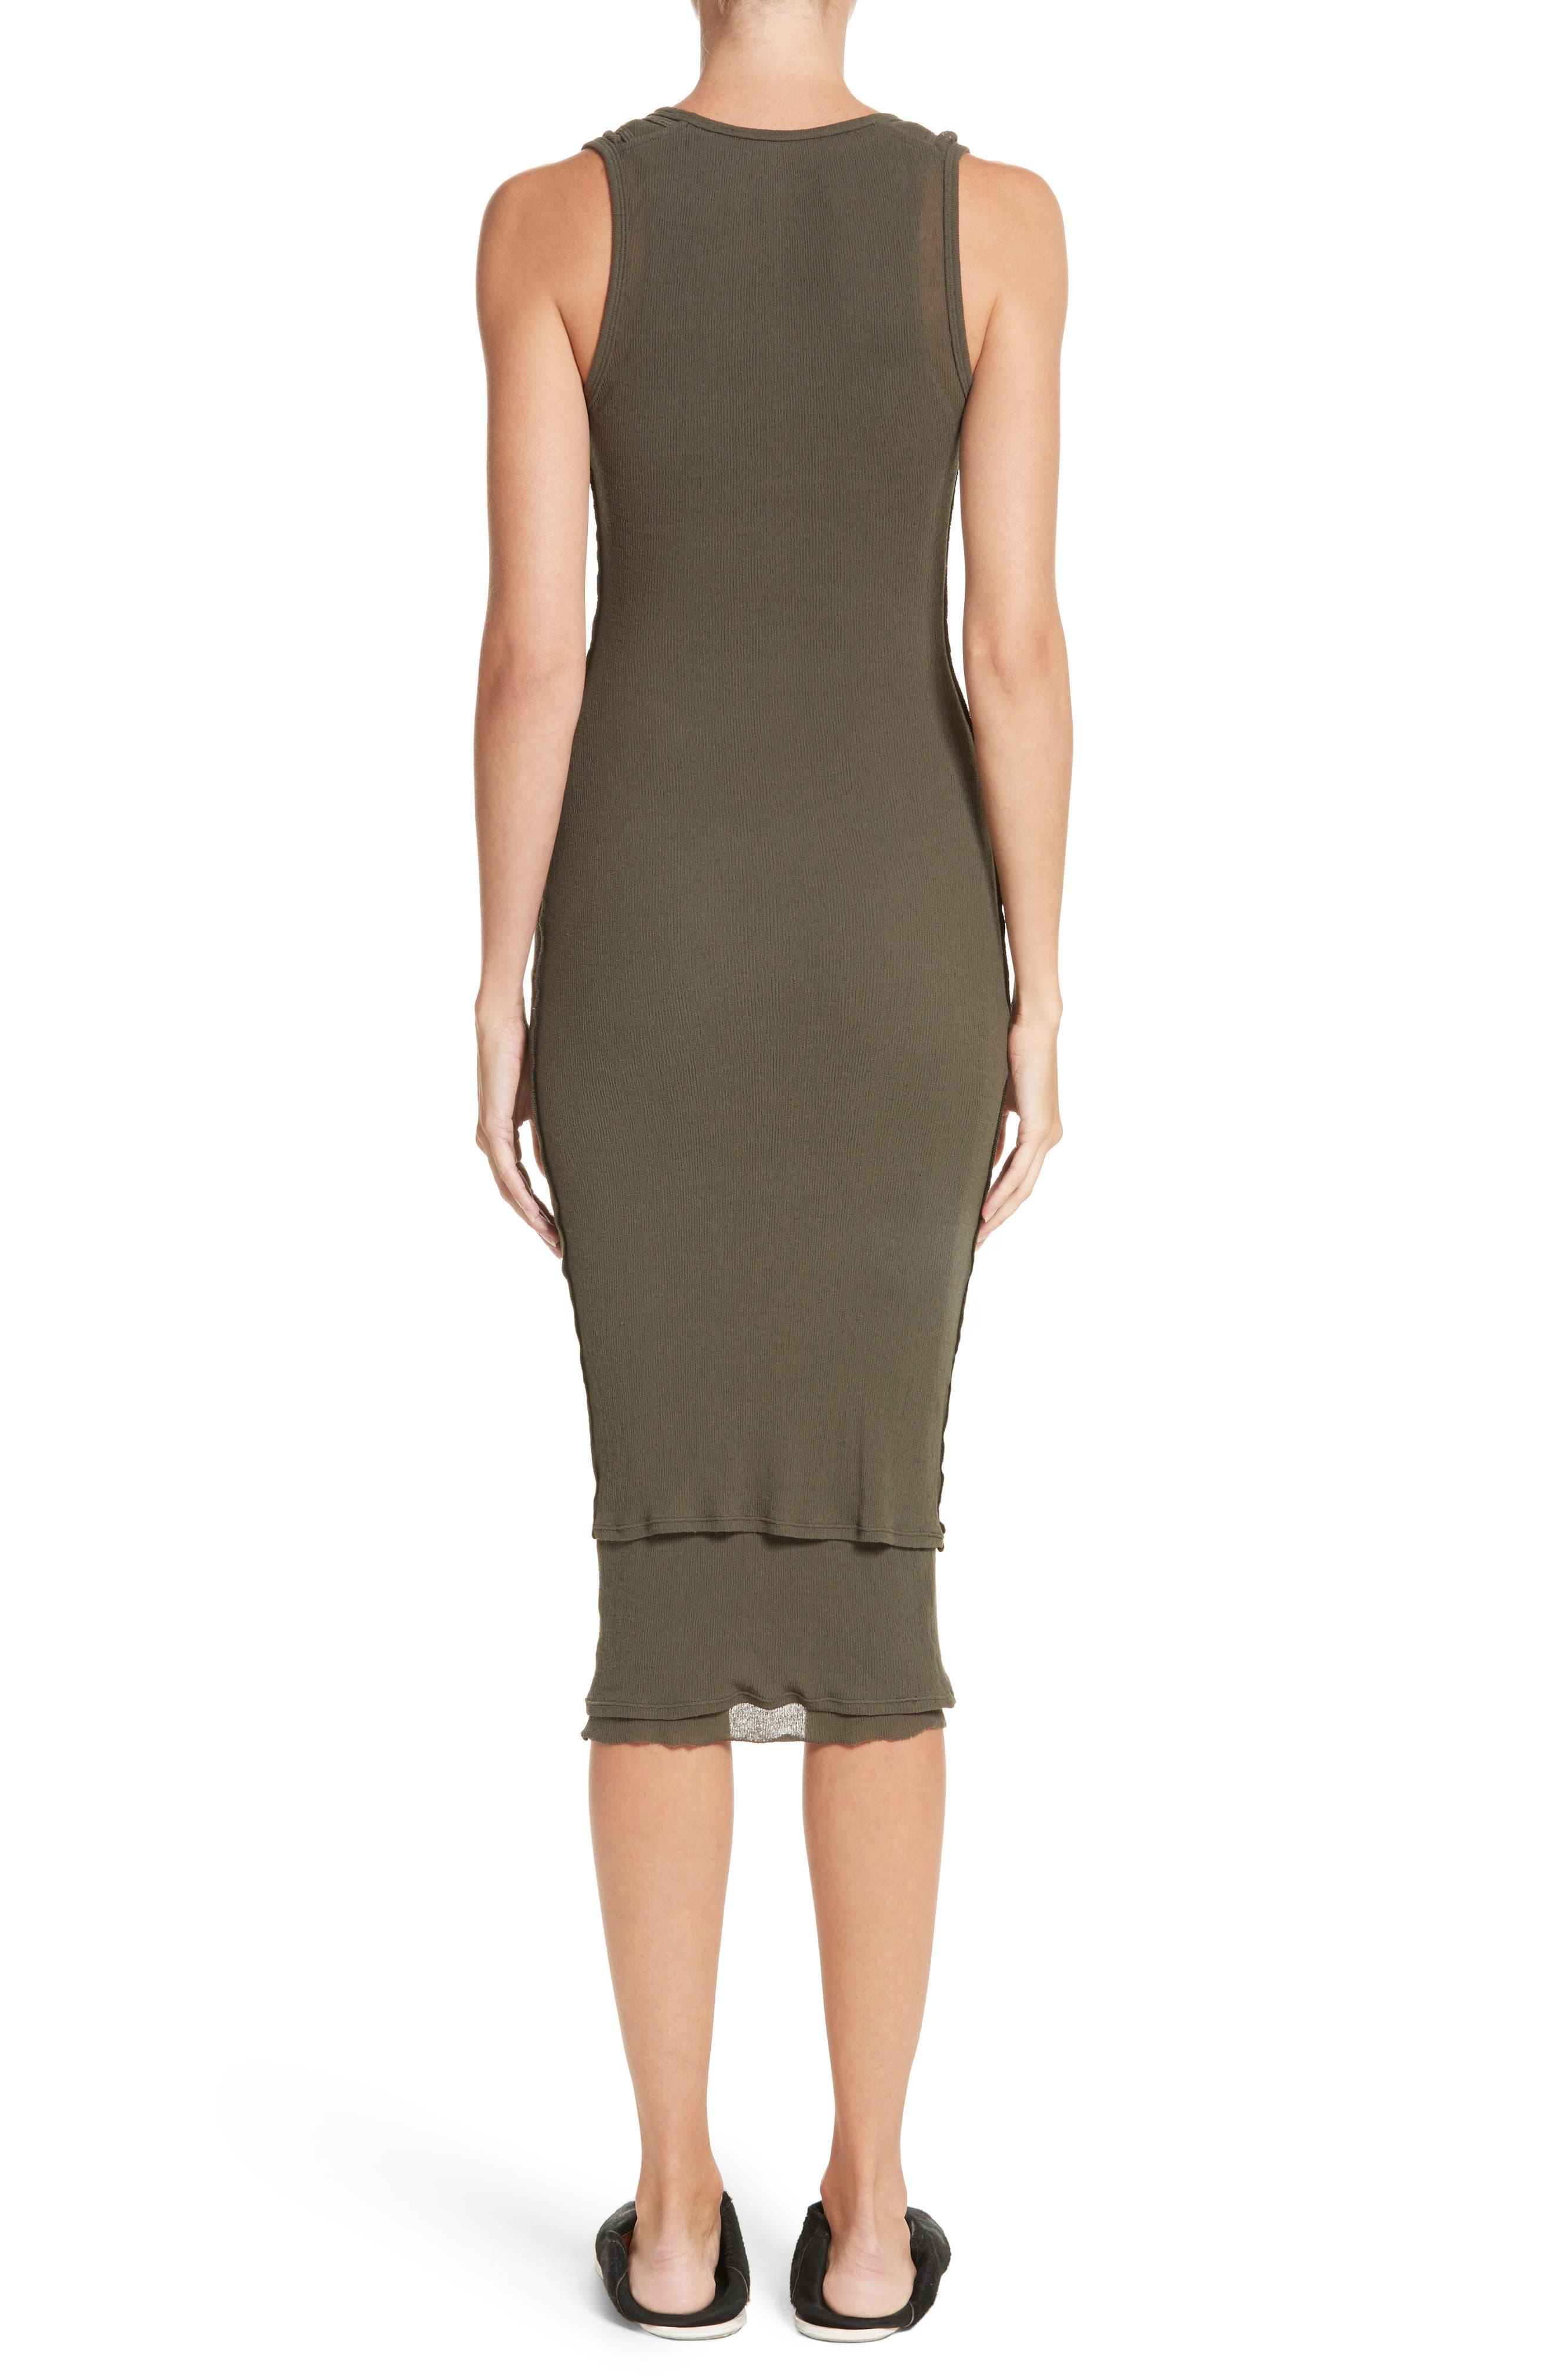 PSWL Jersey Gauze Dress,                             Alternate thumbnail 2, color,                             Army